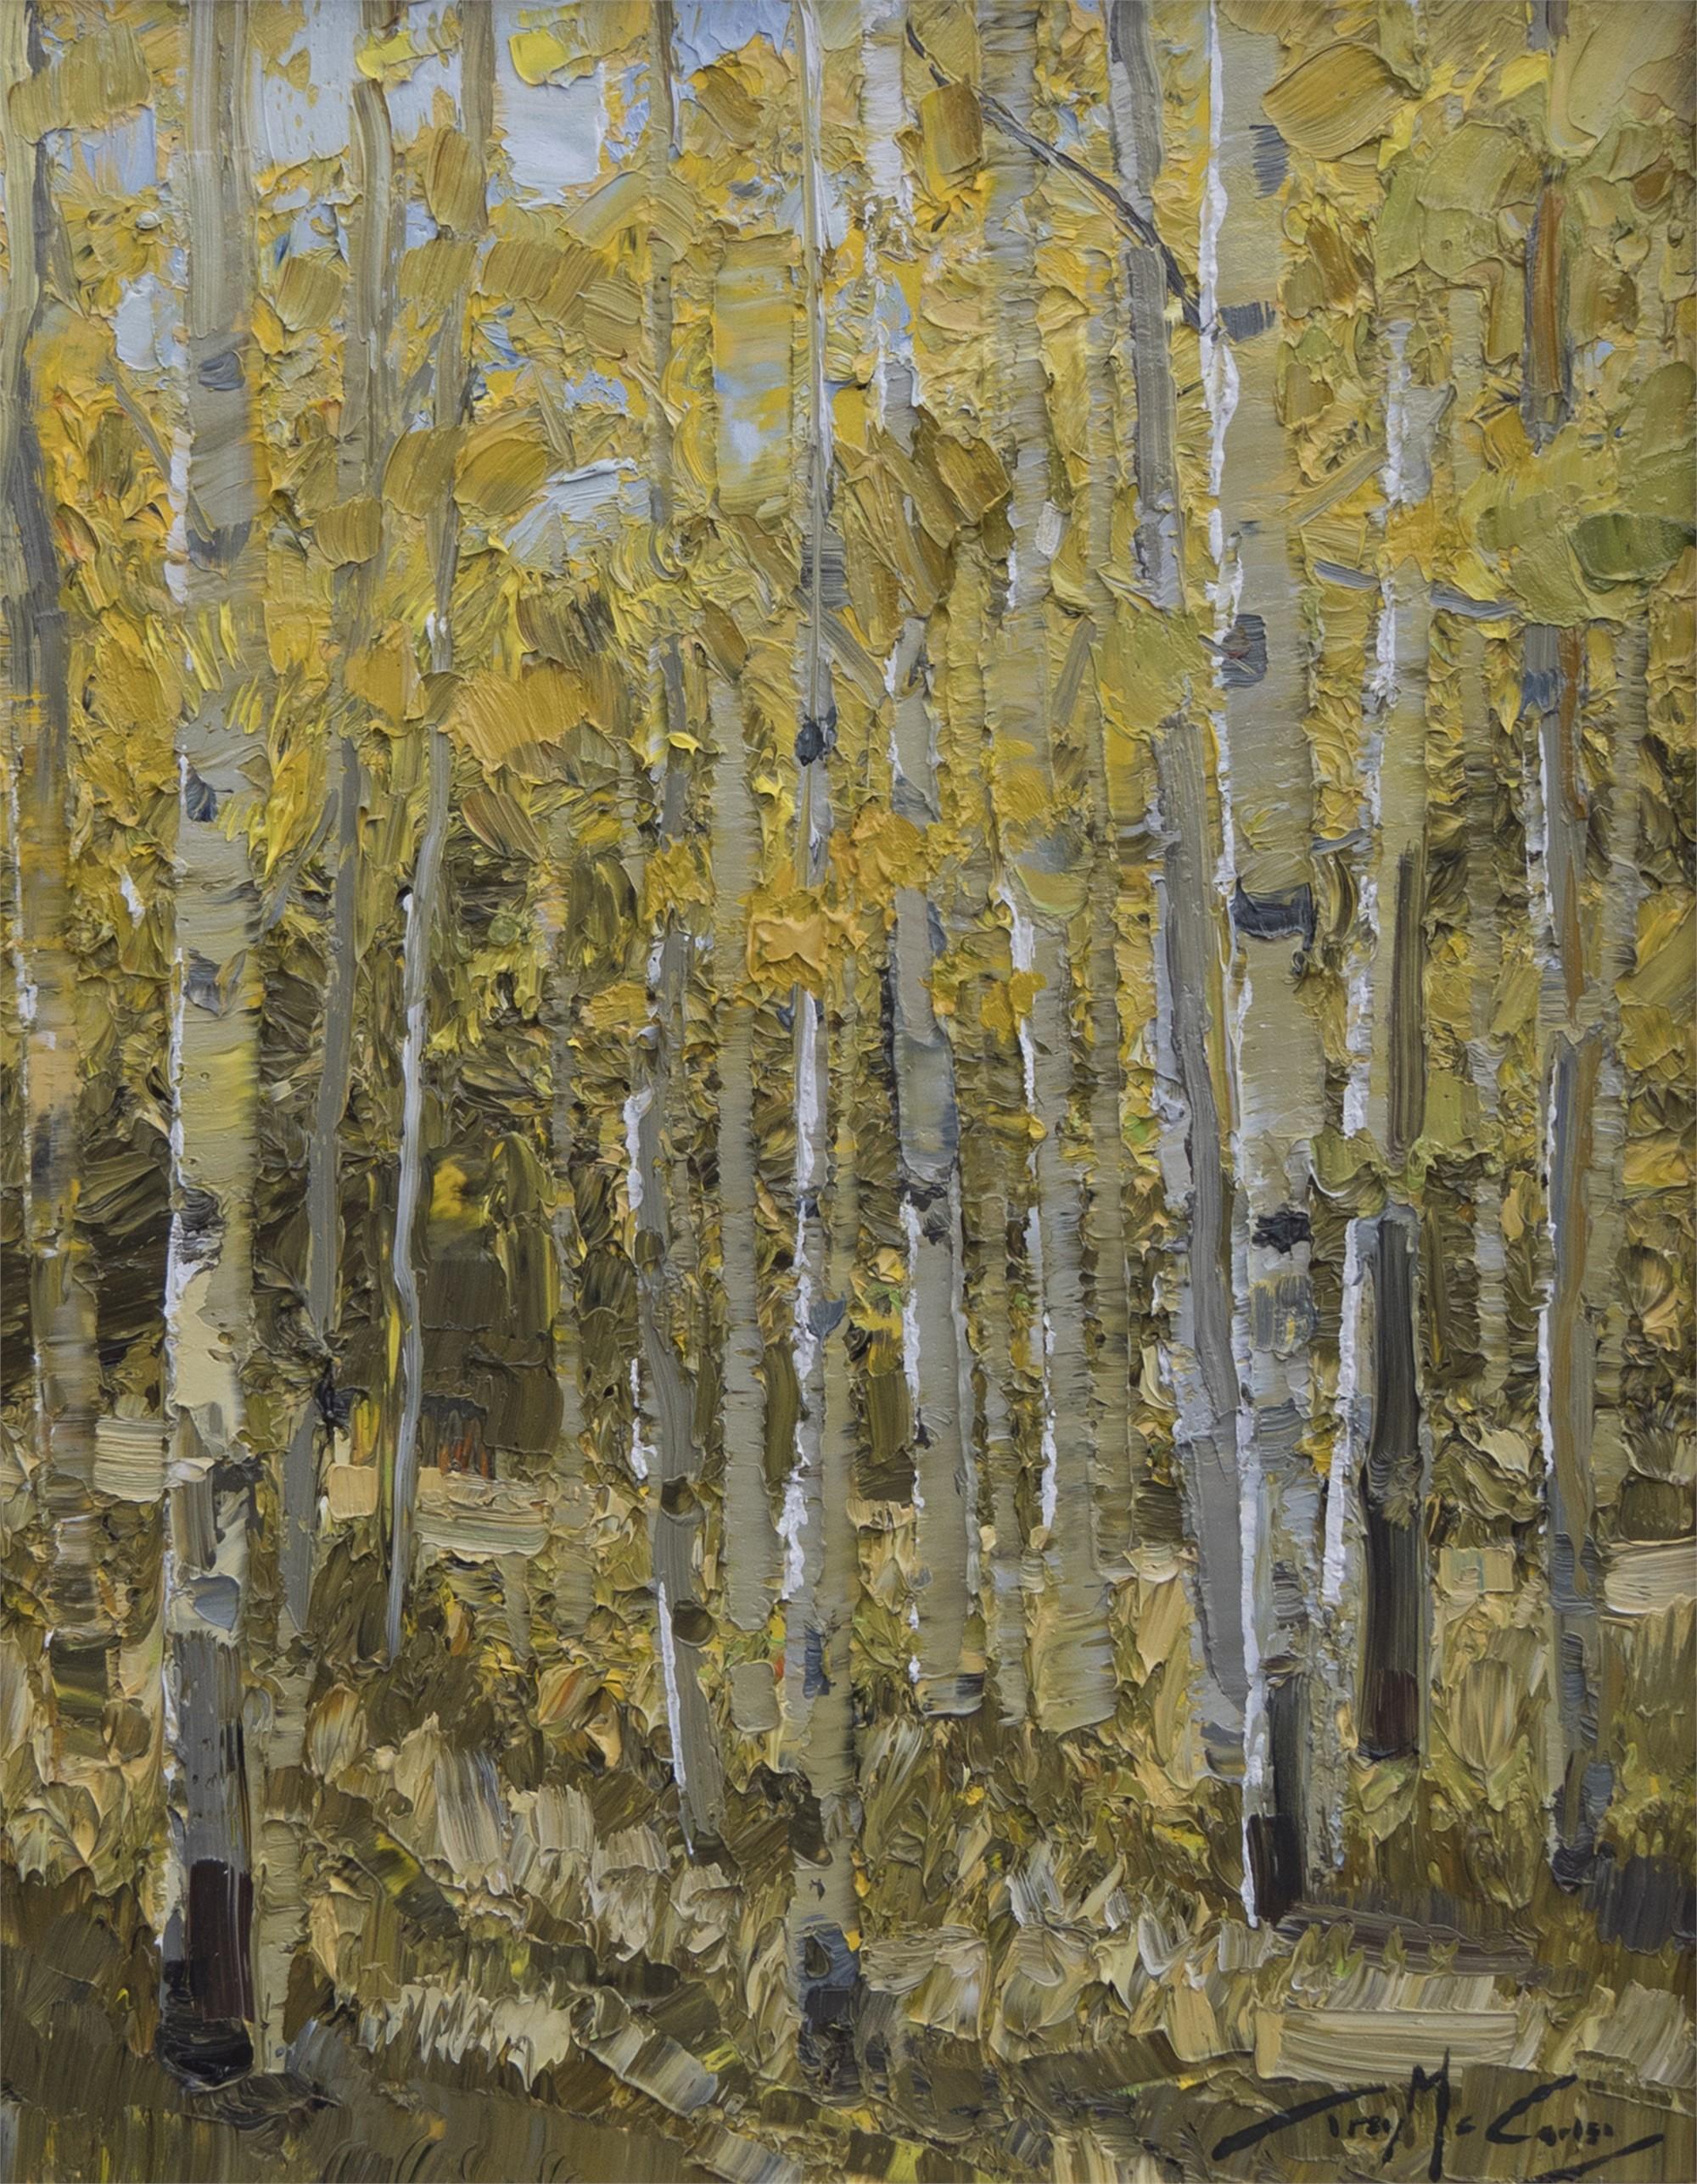 Aspen in Song by Trey McCarley